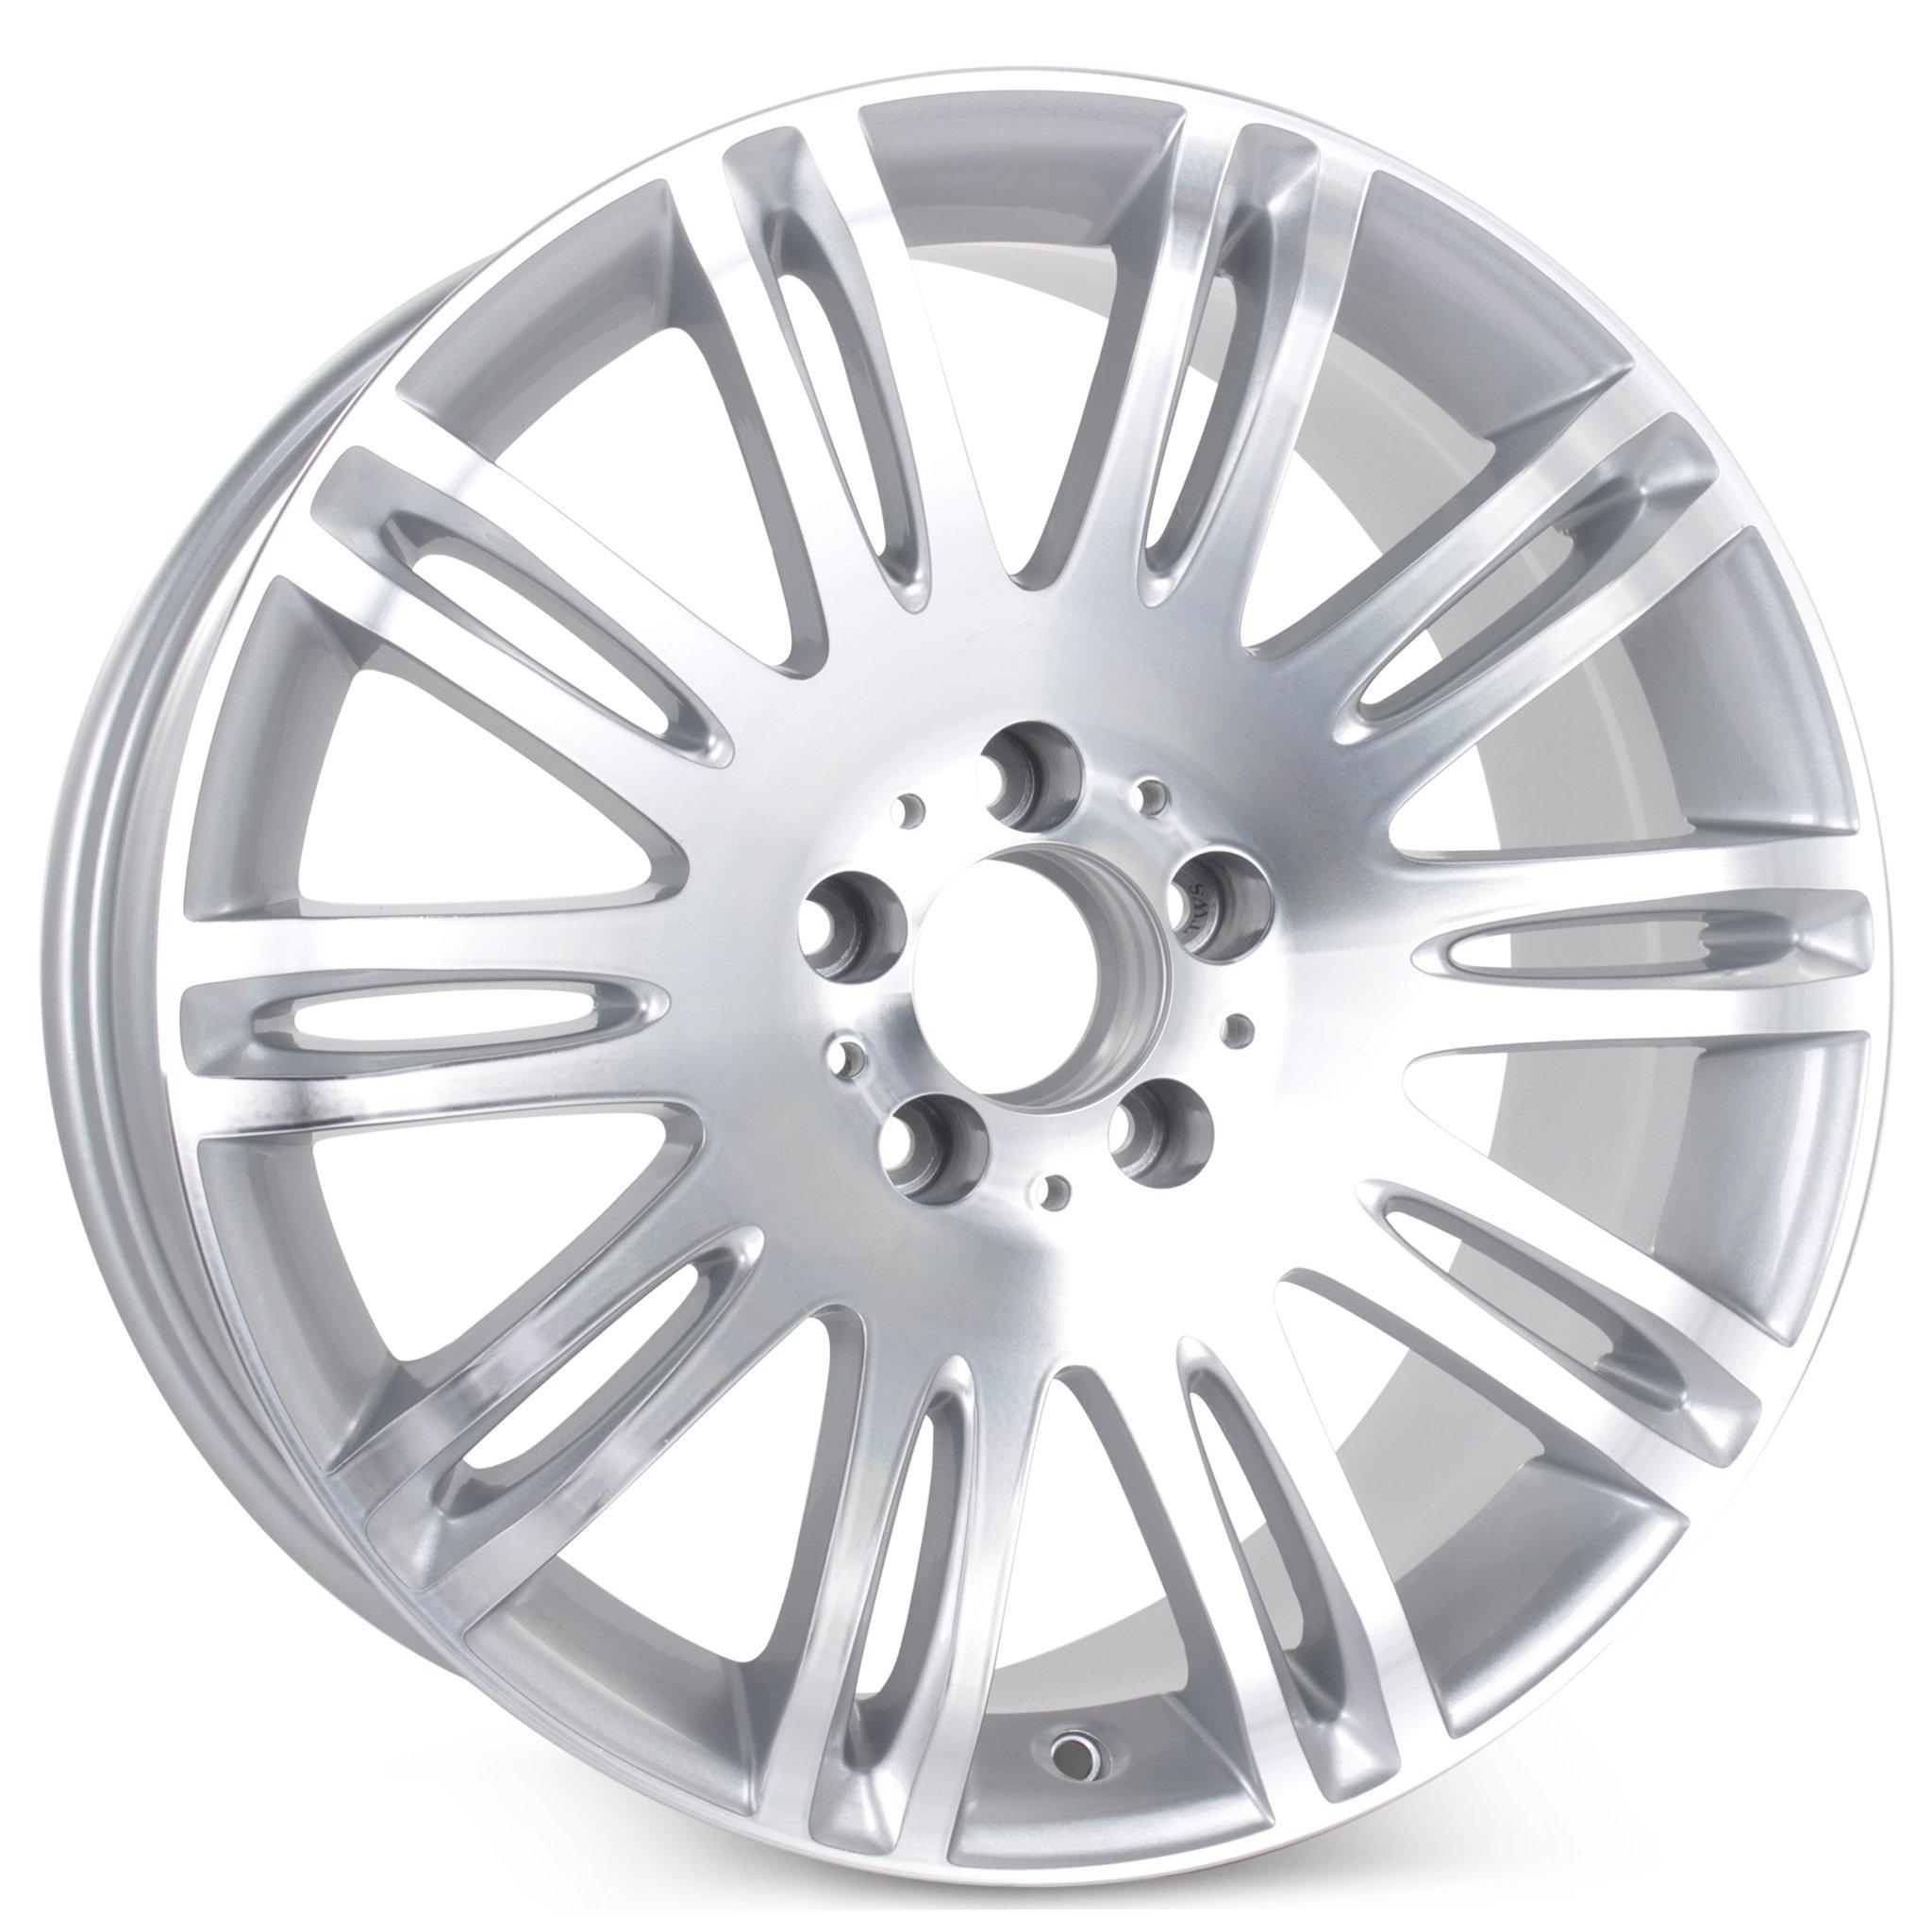 Brand New 18'' x 8.5'' Alloy Replacement Wheel for Mercedes E350 E550 2007 2008 2009 Rim 65432 Machined